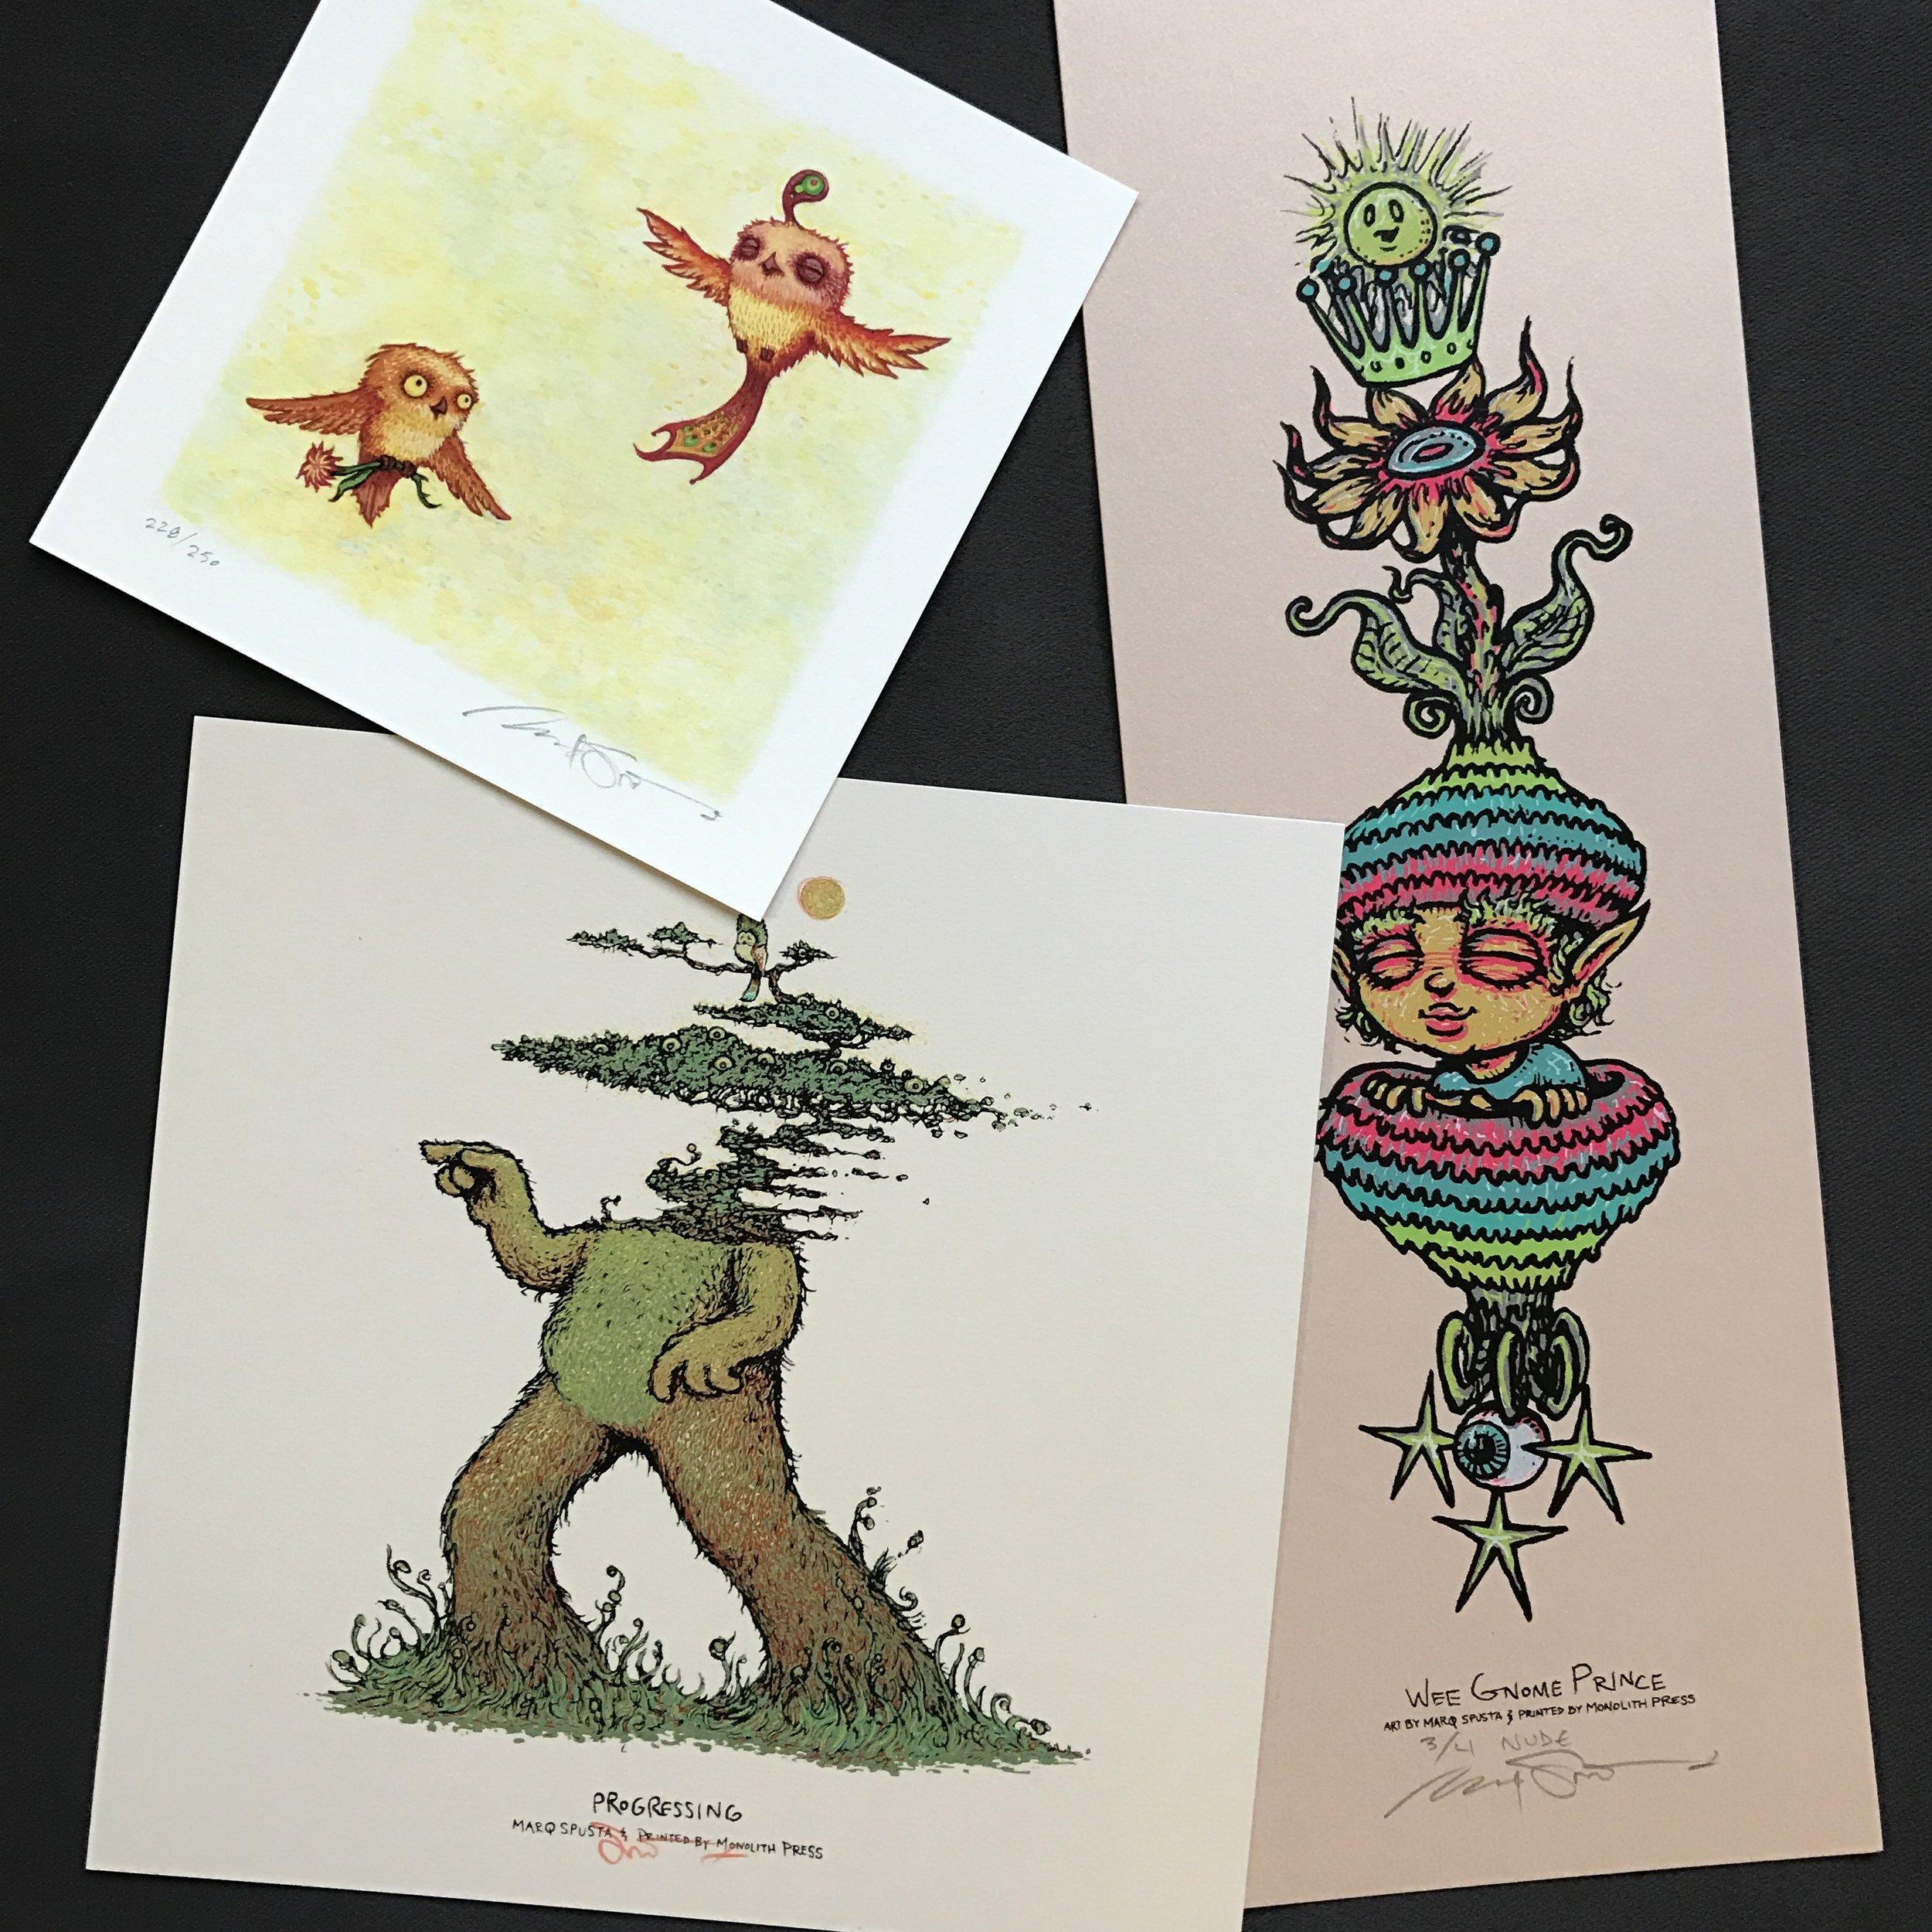 $200 #16 Progressing + Nude Wee Gnome Prince (edition of 4) + Happy Pleasant Flight